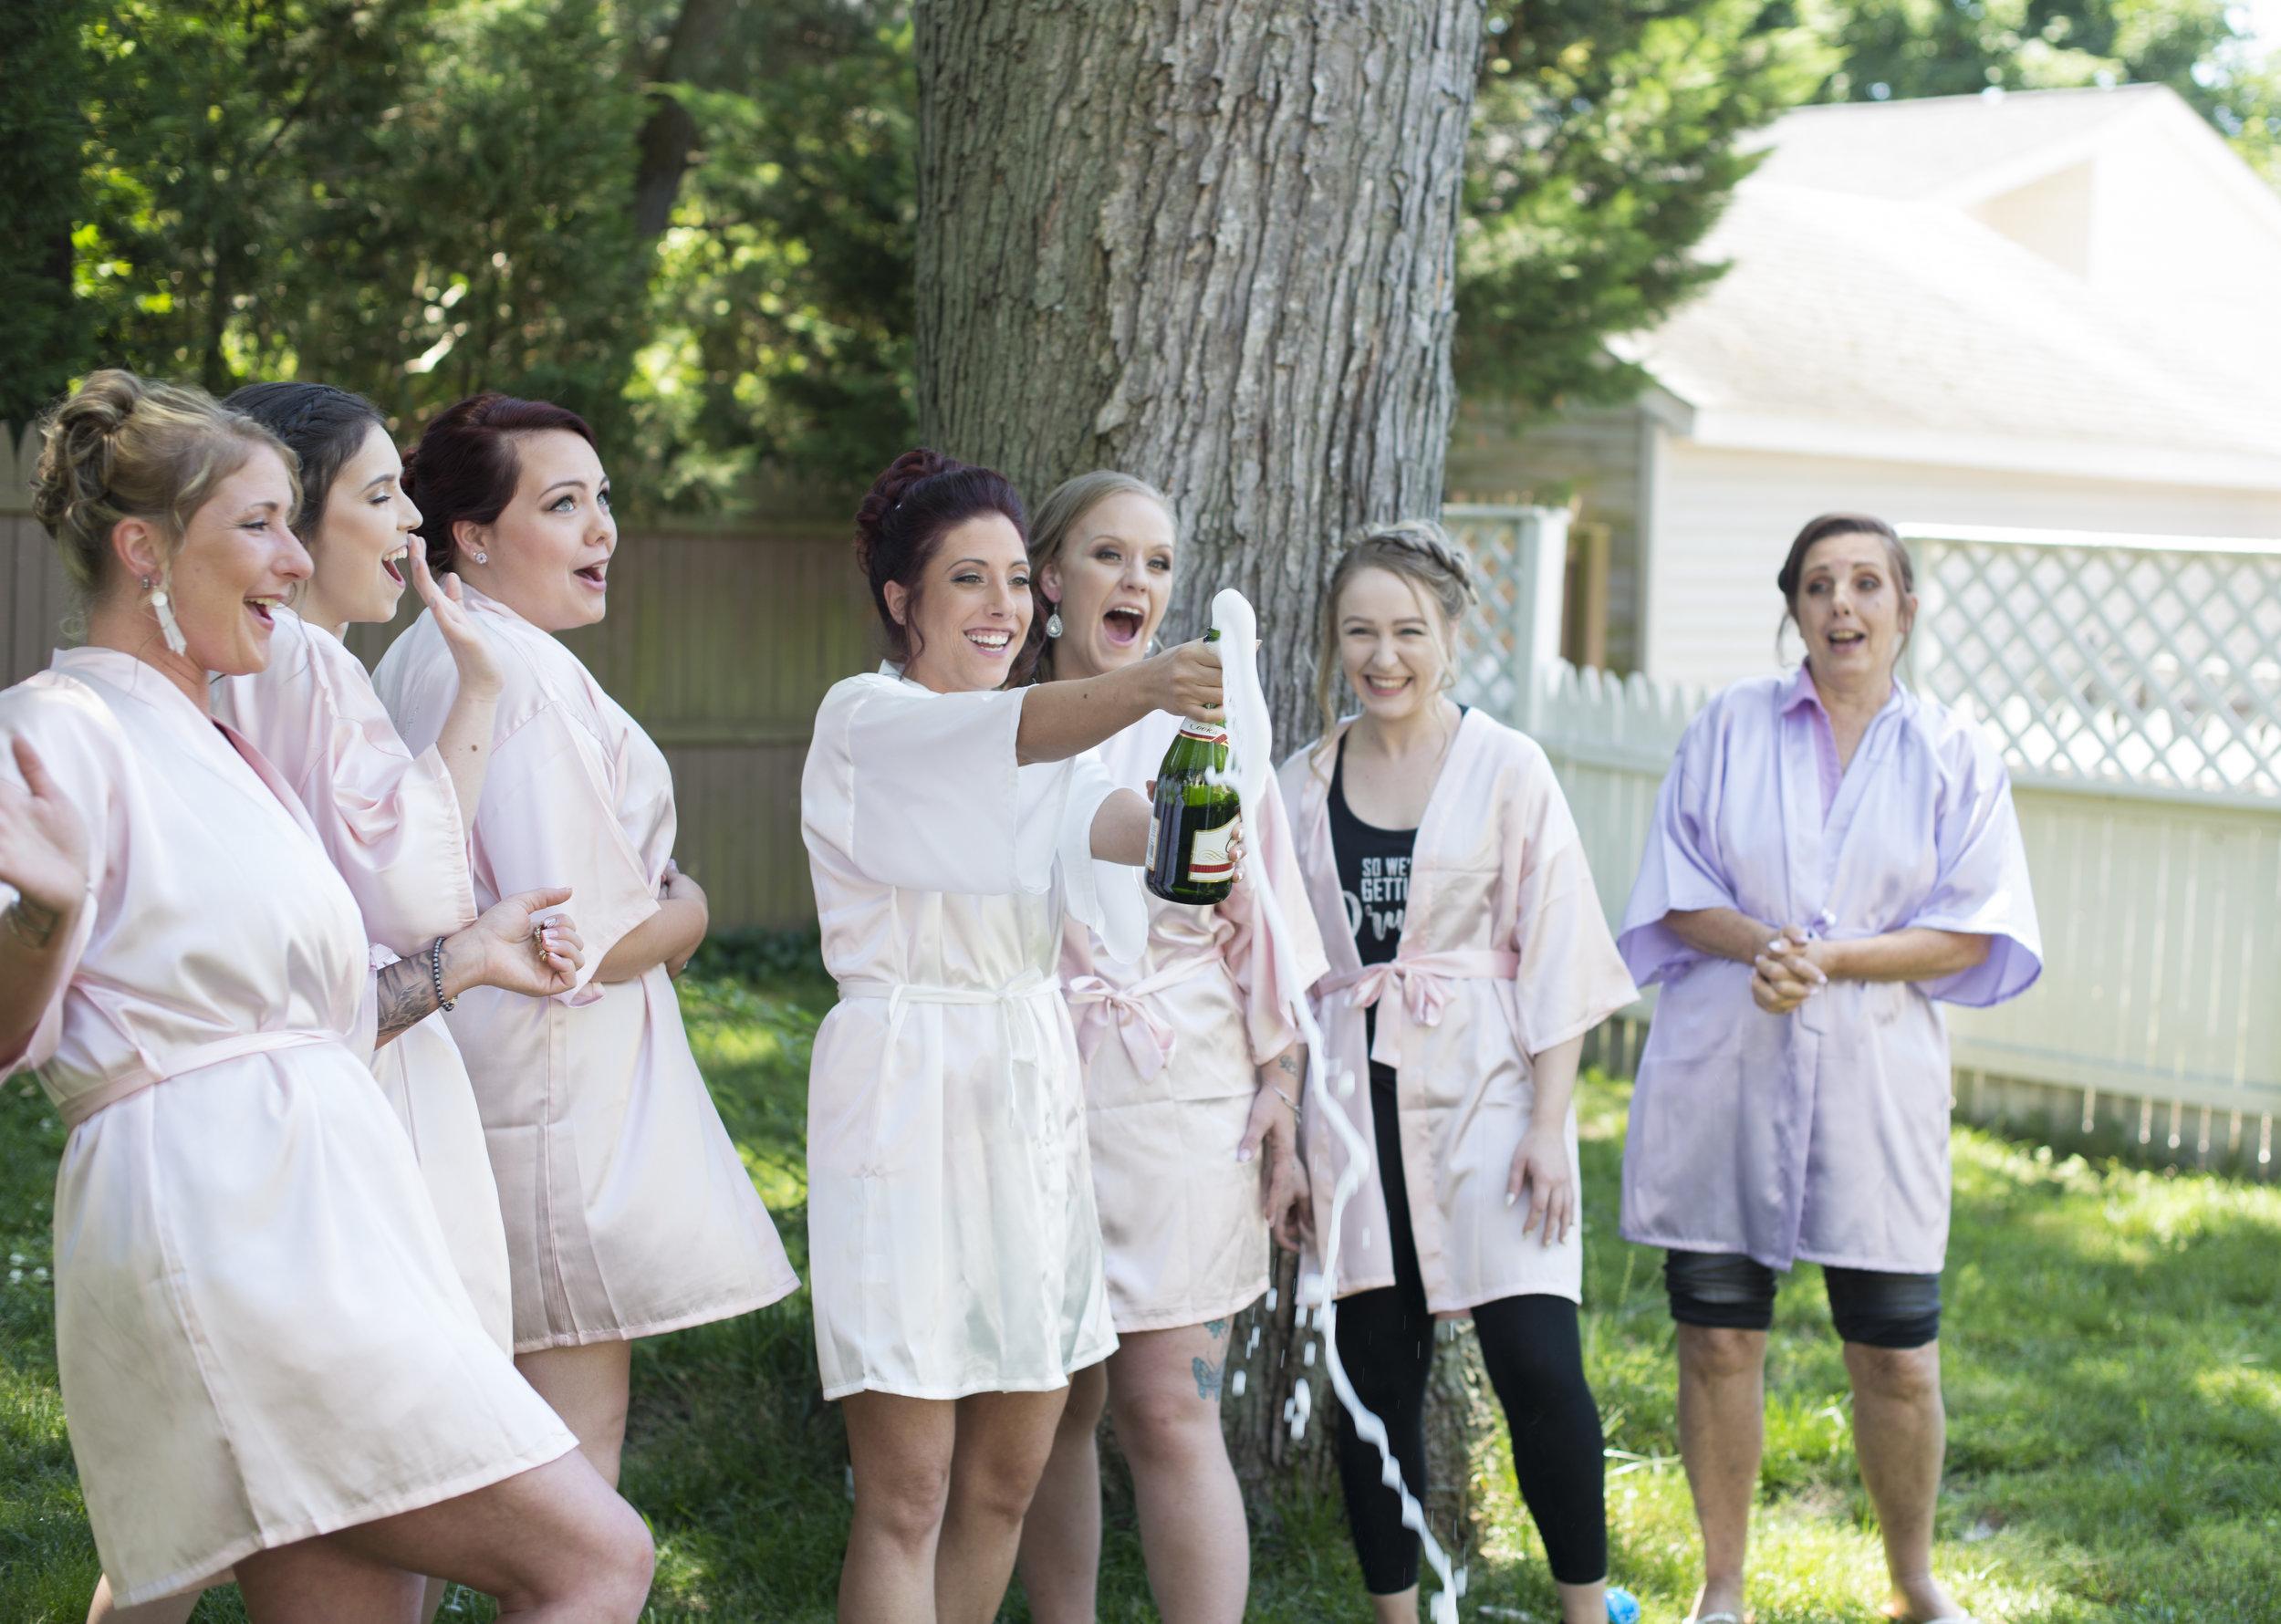 New Jersey based wedding photography